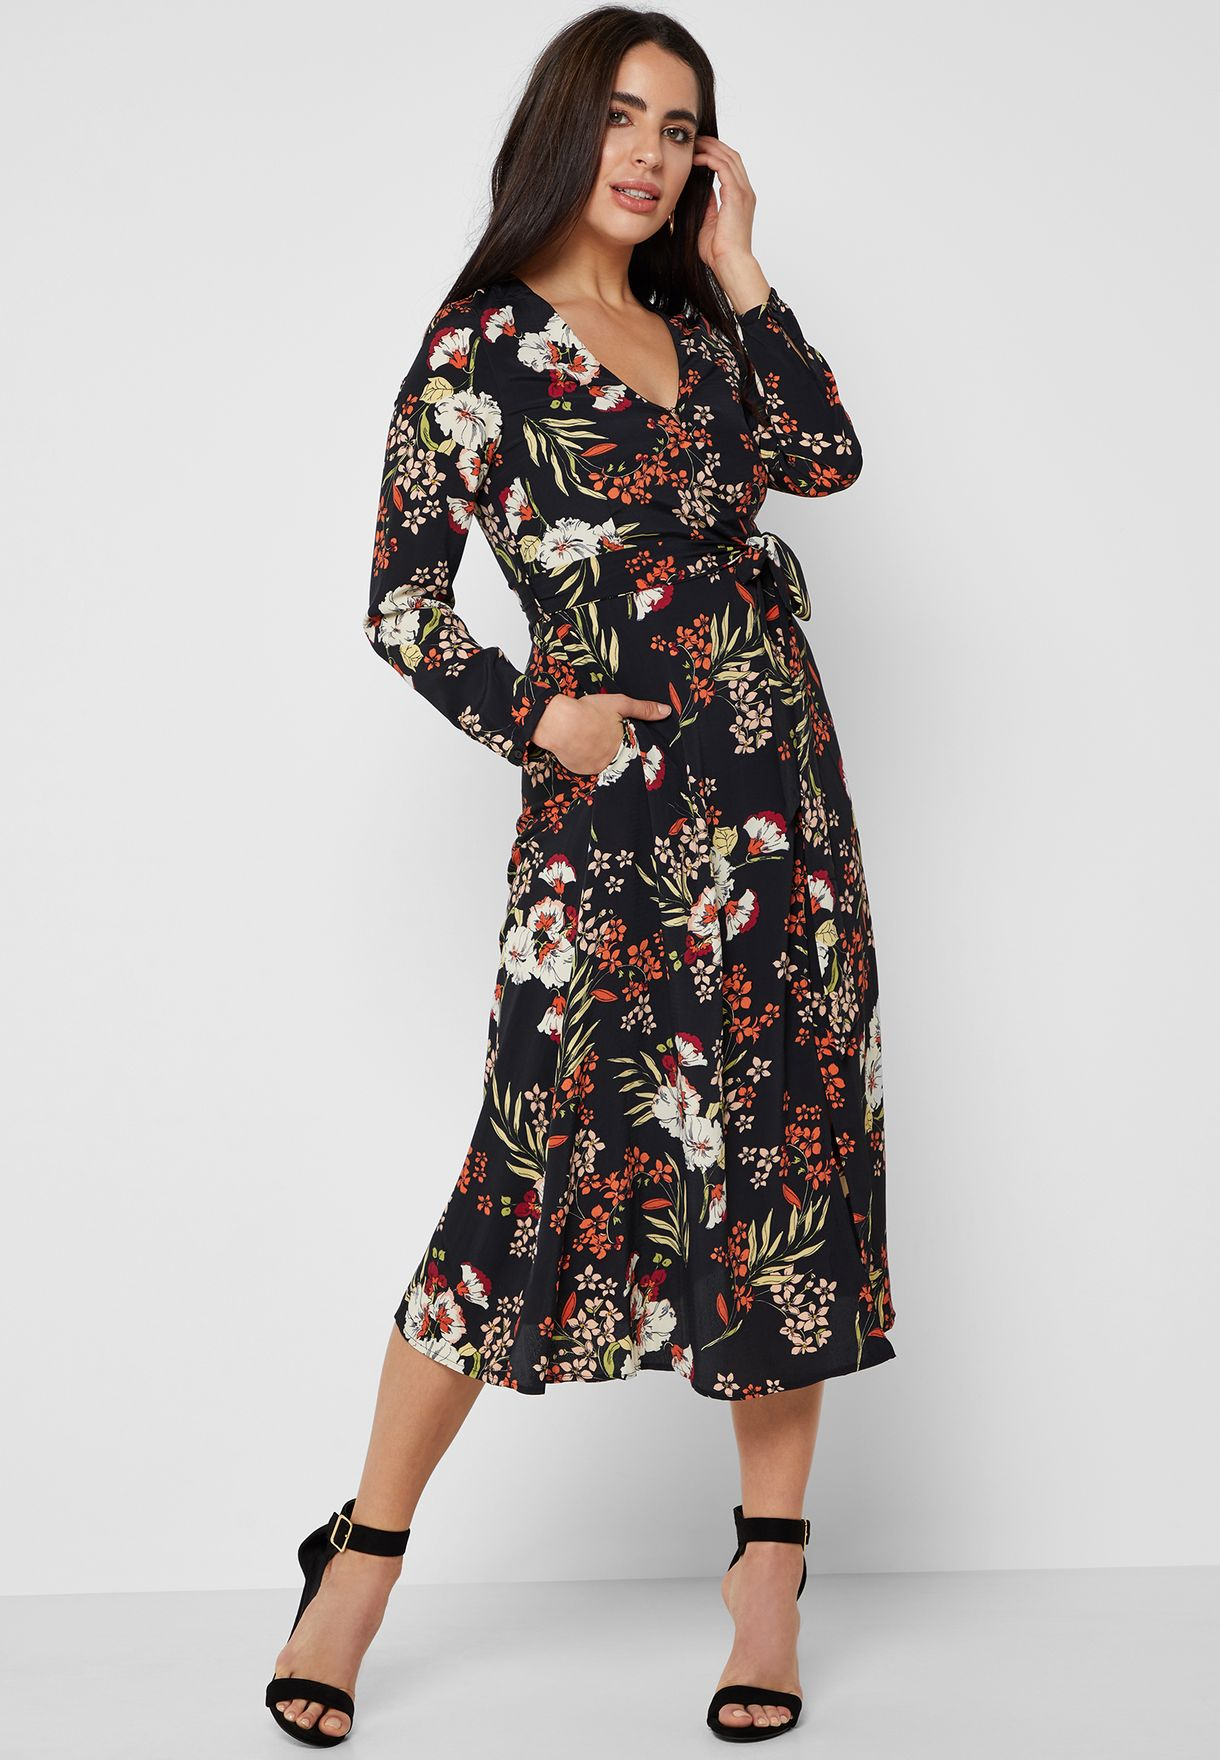 f752c71a0 Shop Ella prints Floral Print Wrap Front Midi Dress 35025 for Women ...